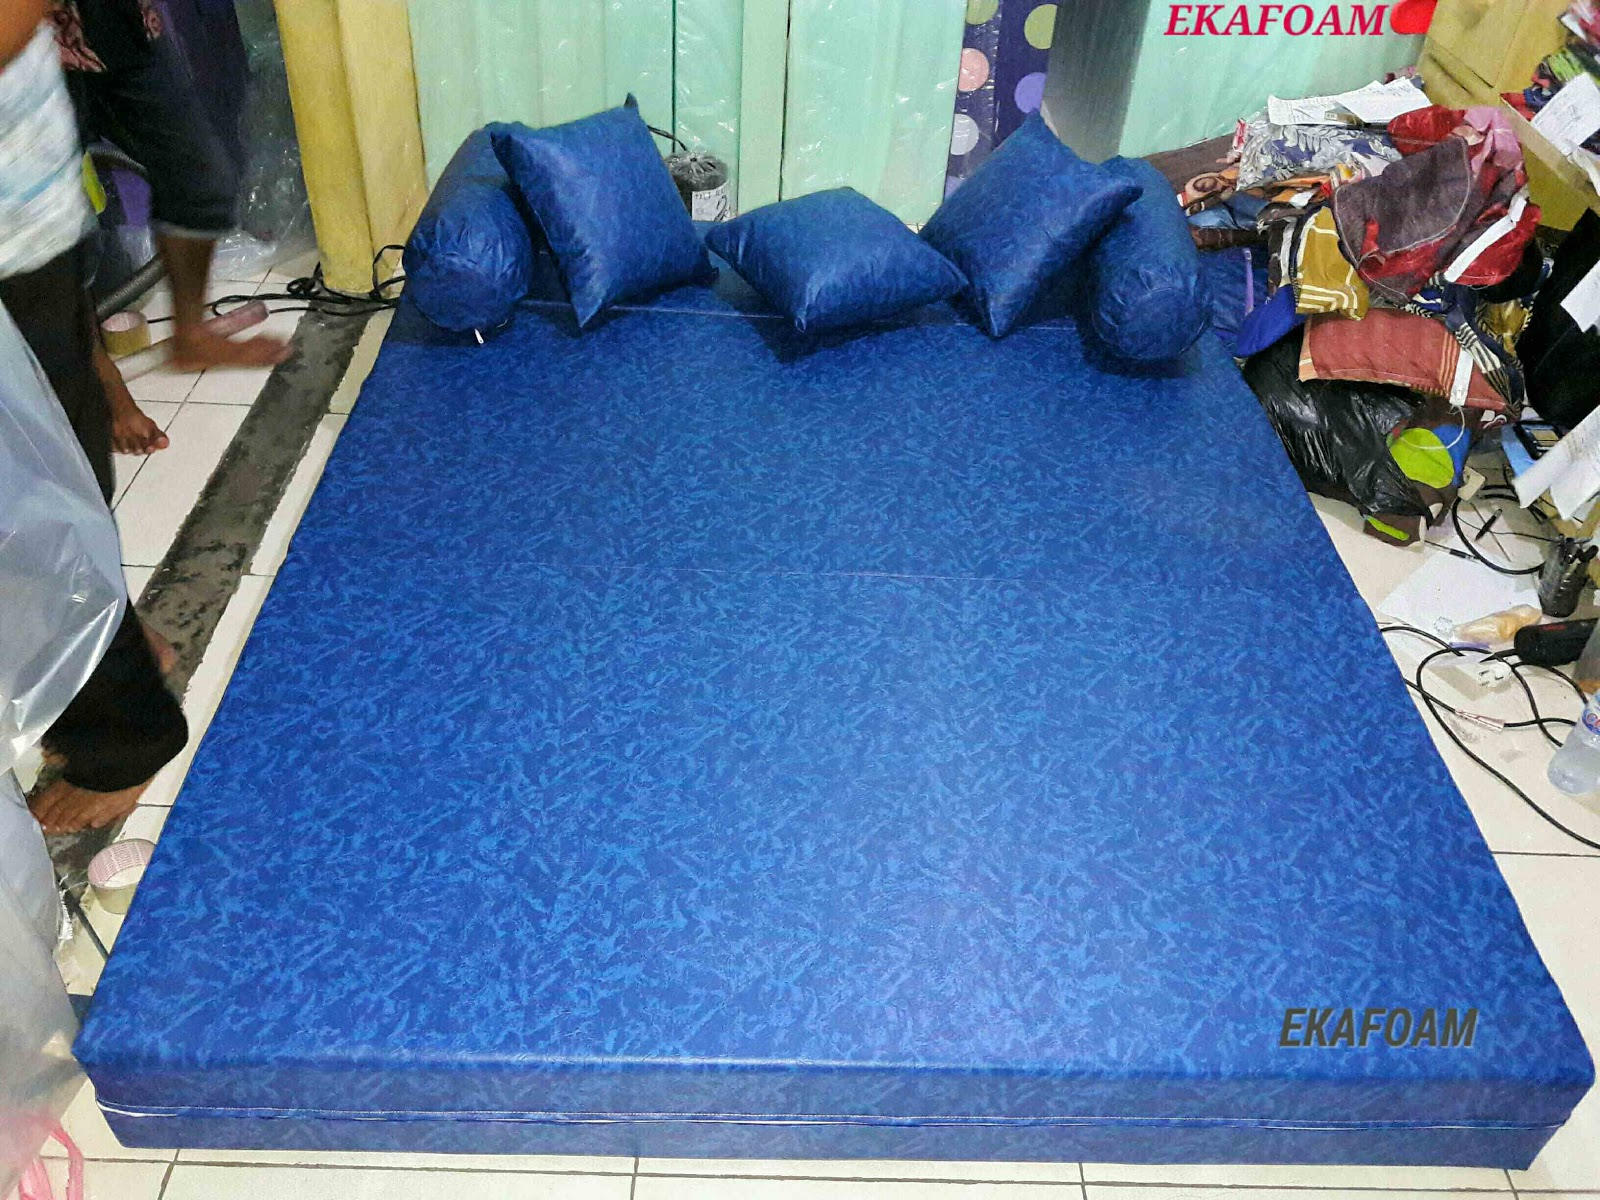 sofa bed inoac 3 in 1 2 seater laura ashley agen jual kasur busa ef